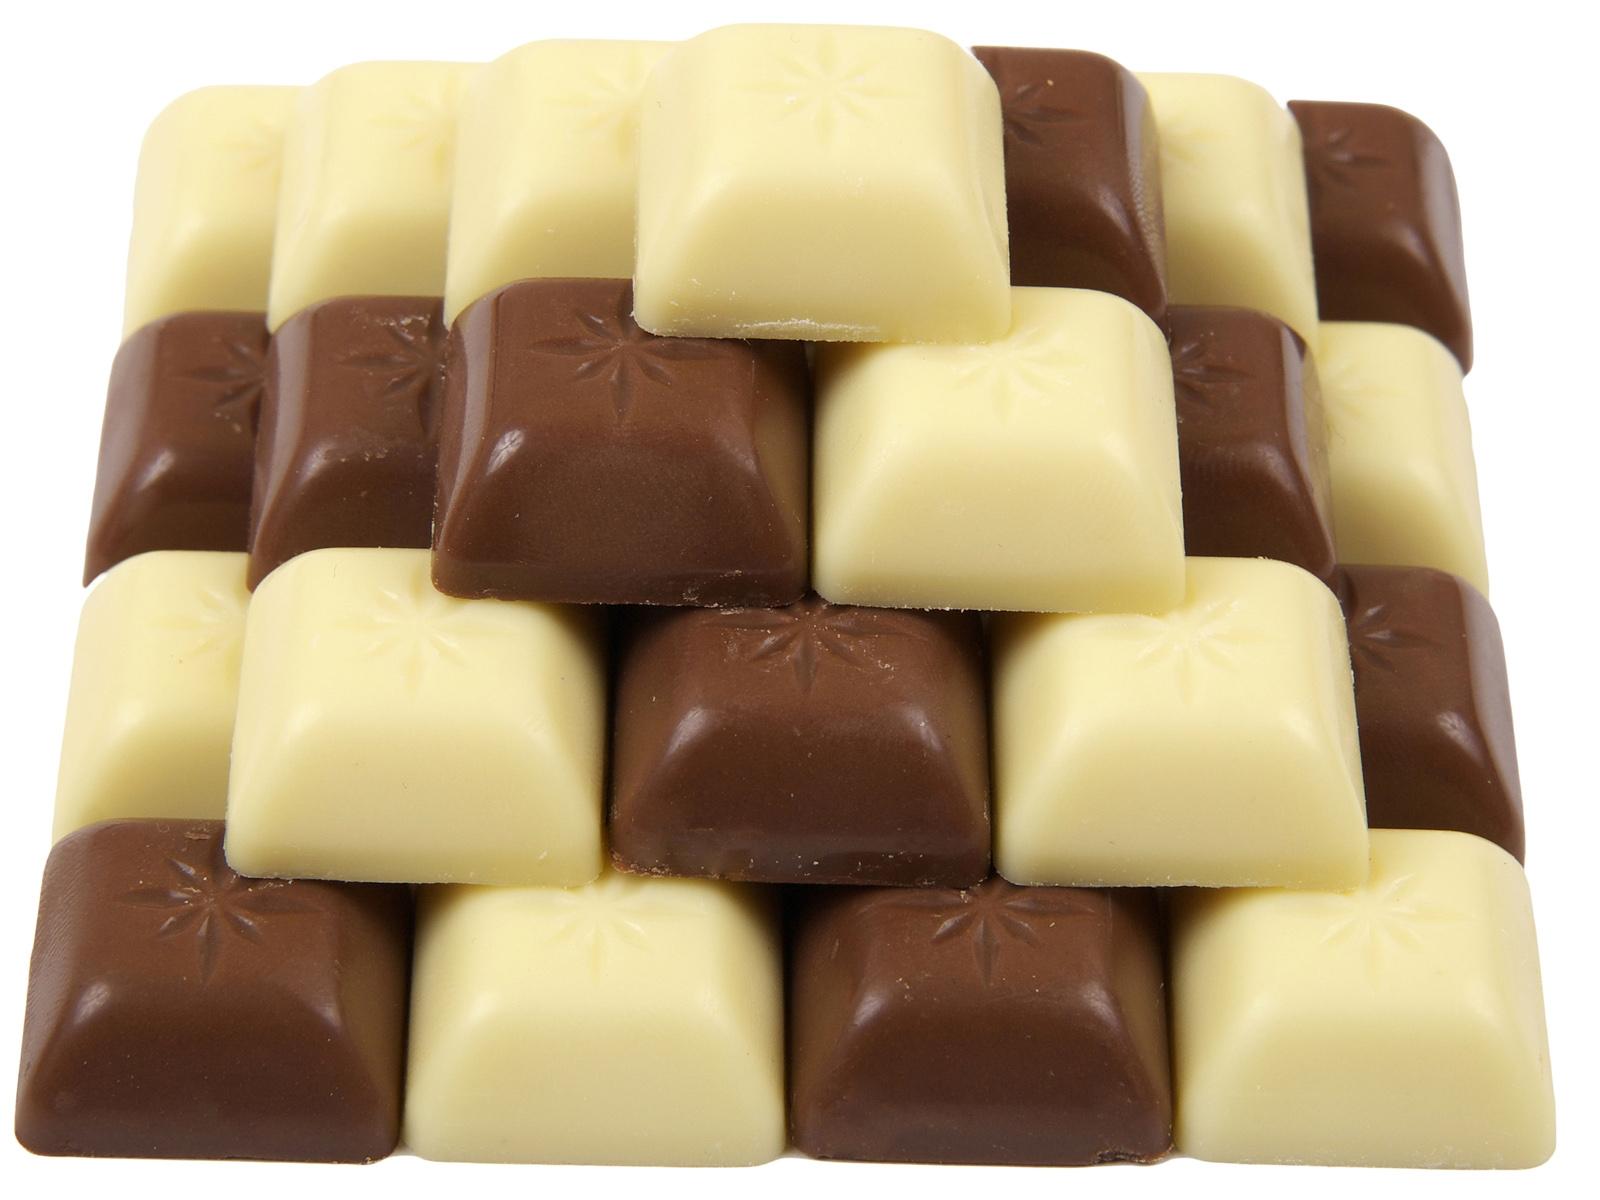 картинки конфеты и шоколад